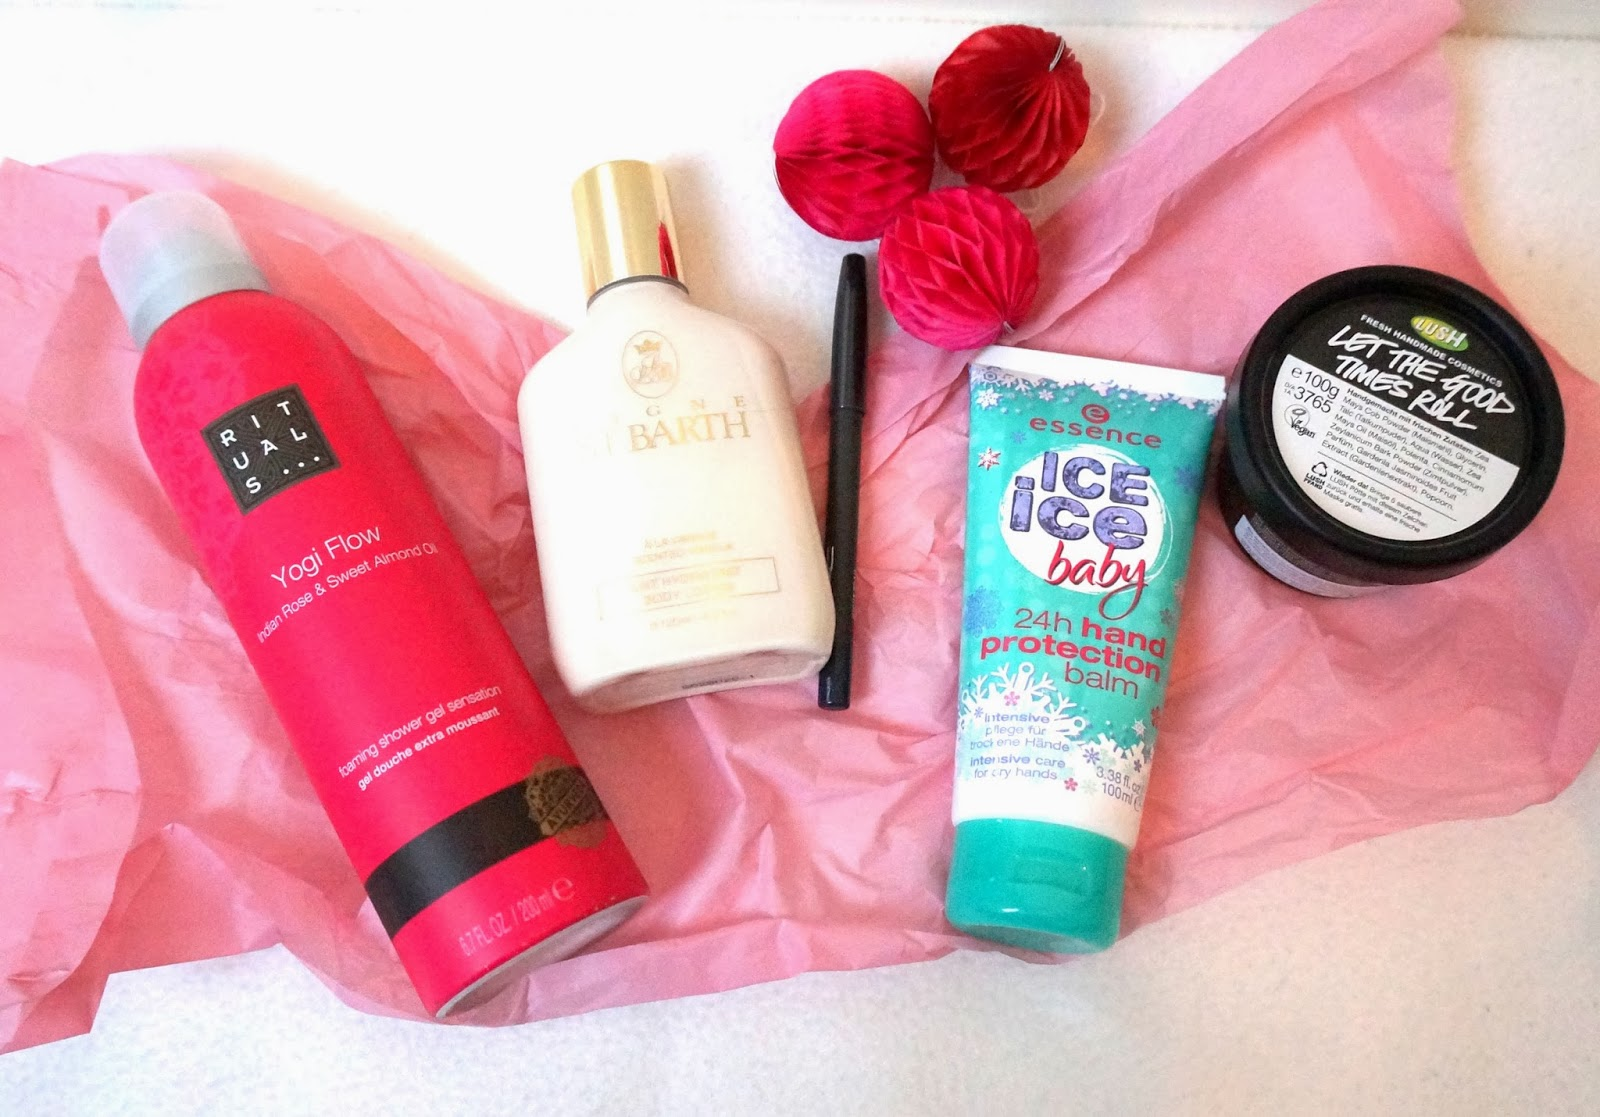 Beautyfavoriten Beauty Rituals essence St.Barth Bodylotion Lush Popcorn Gesichtsreiniger MAC Mäc Handcreme Kosmetik